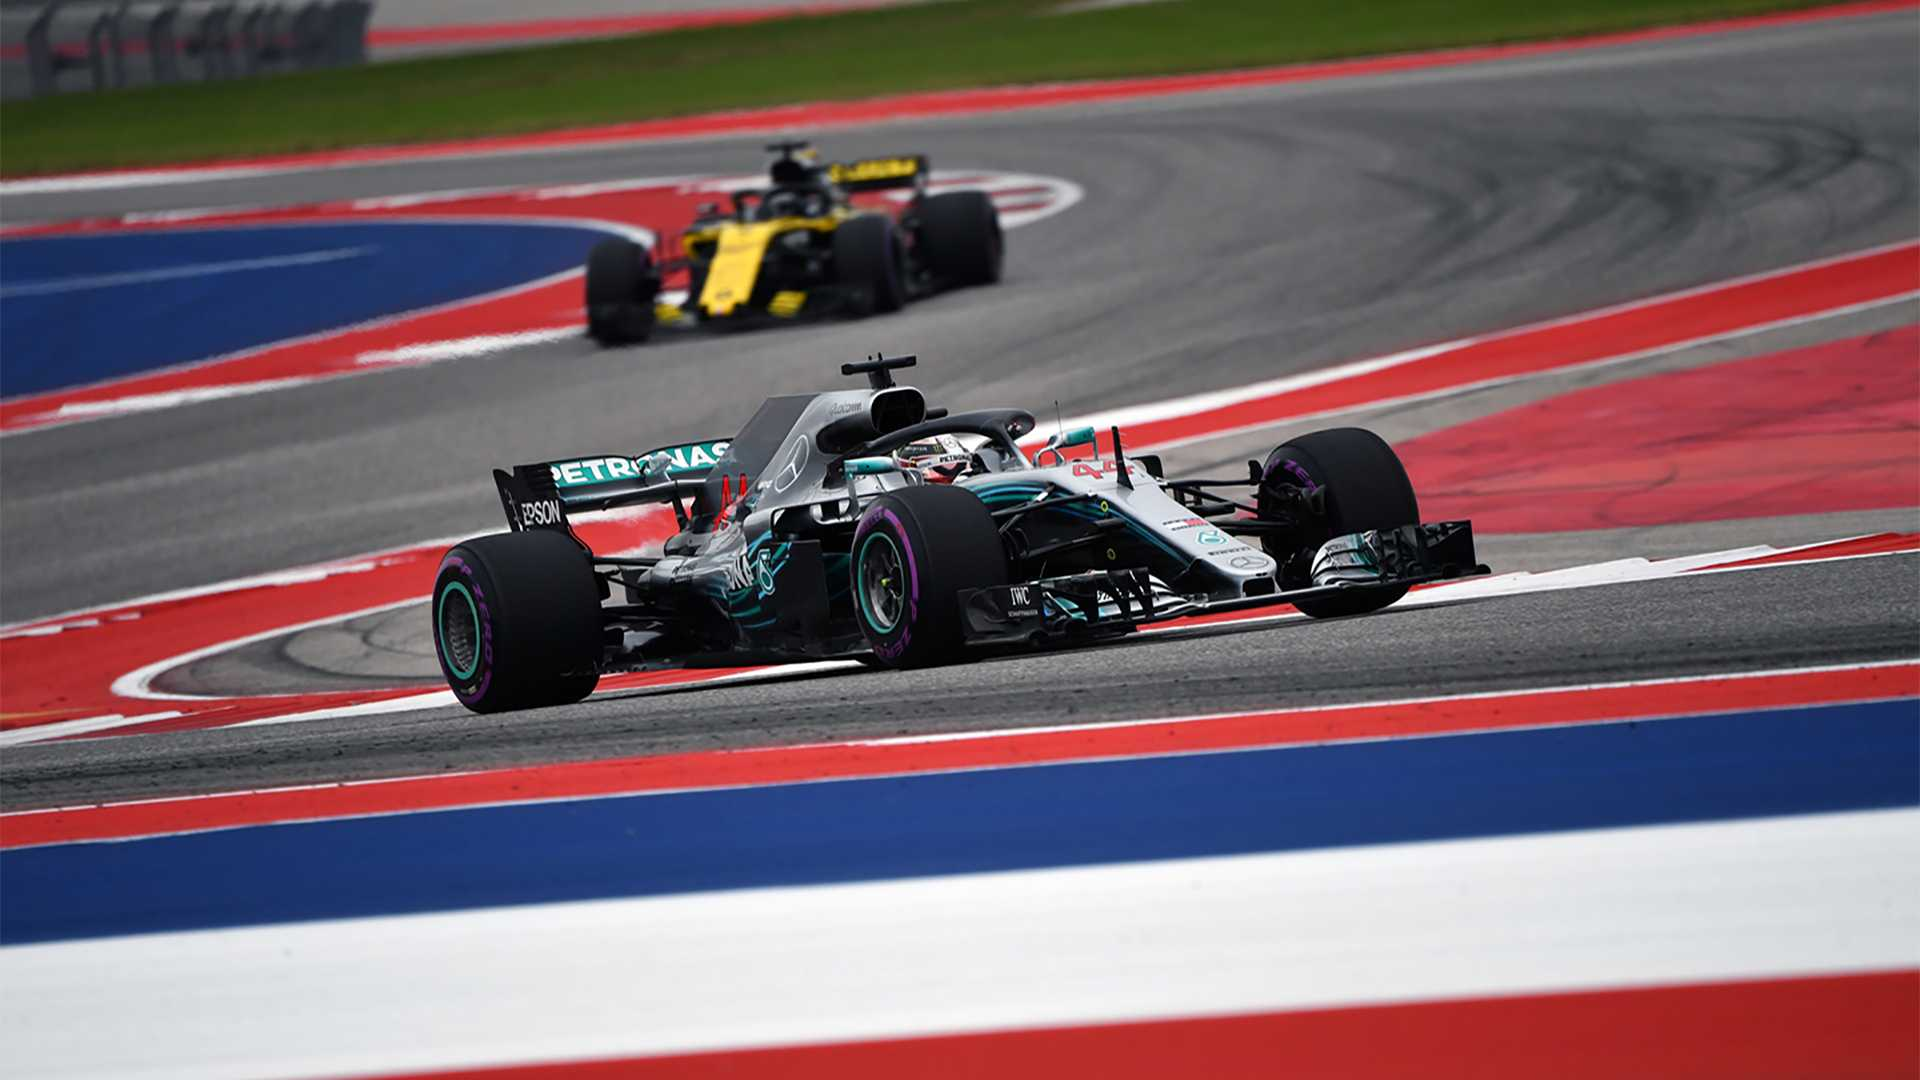 Us Grand Prix >> Motor1 Com Exclusive Enter To Win A 2019 Formula 1 U S Grand Prix